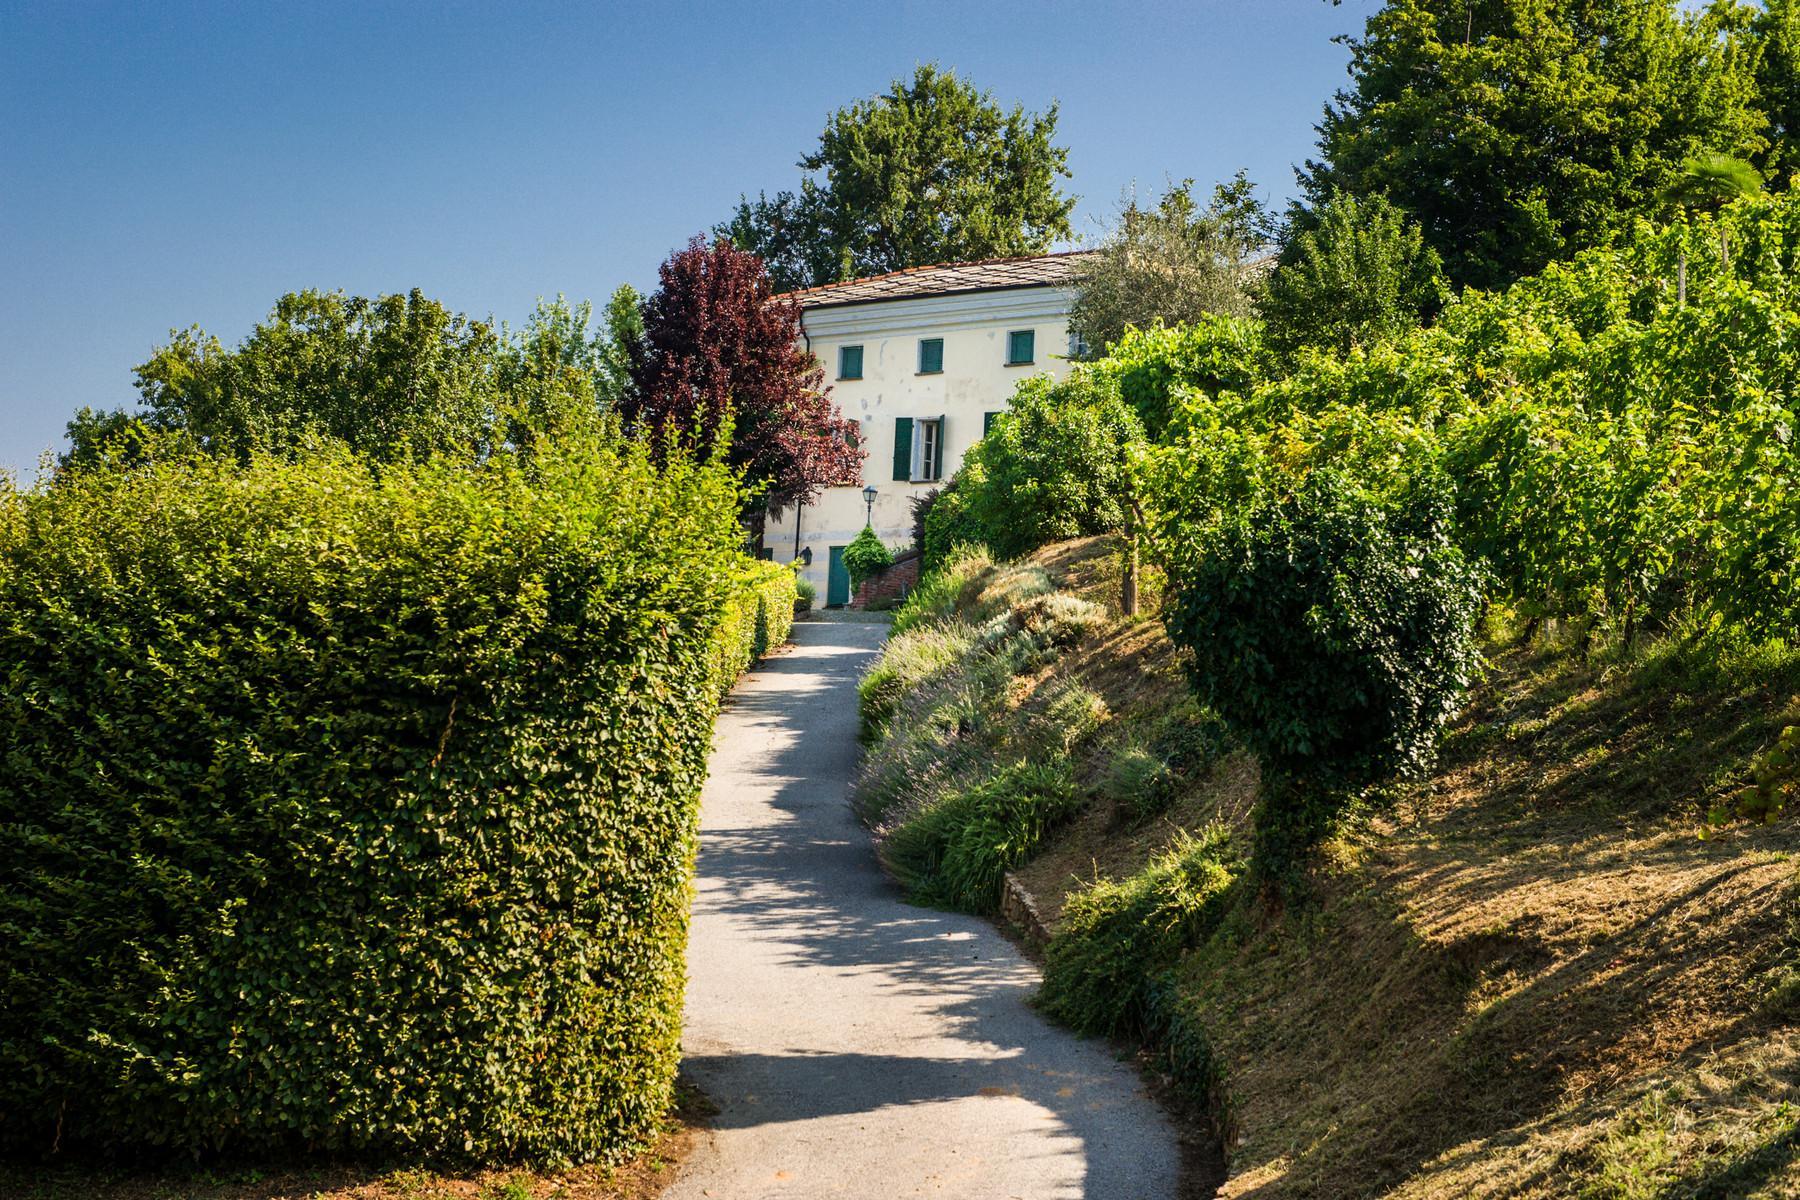 Splendid villa with winery in Piedmont - 3